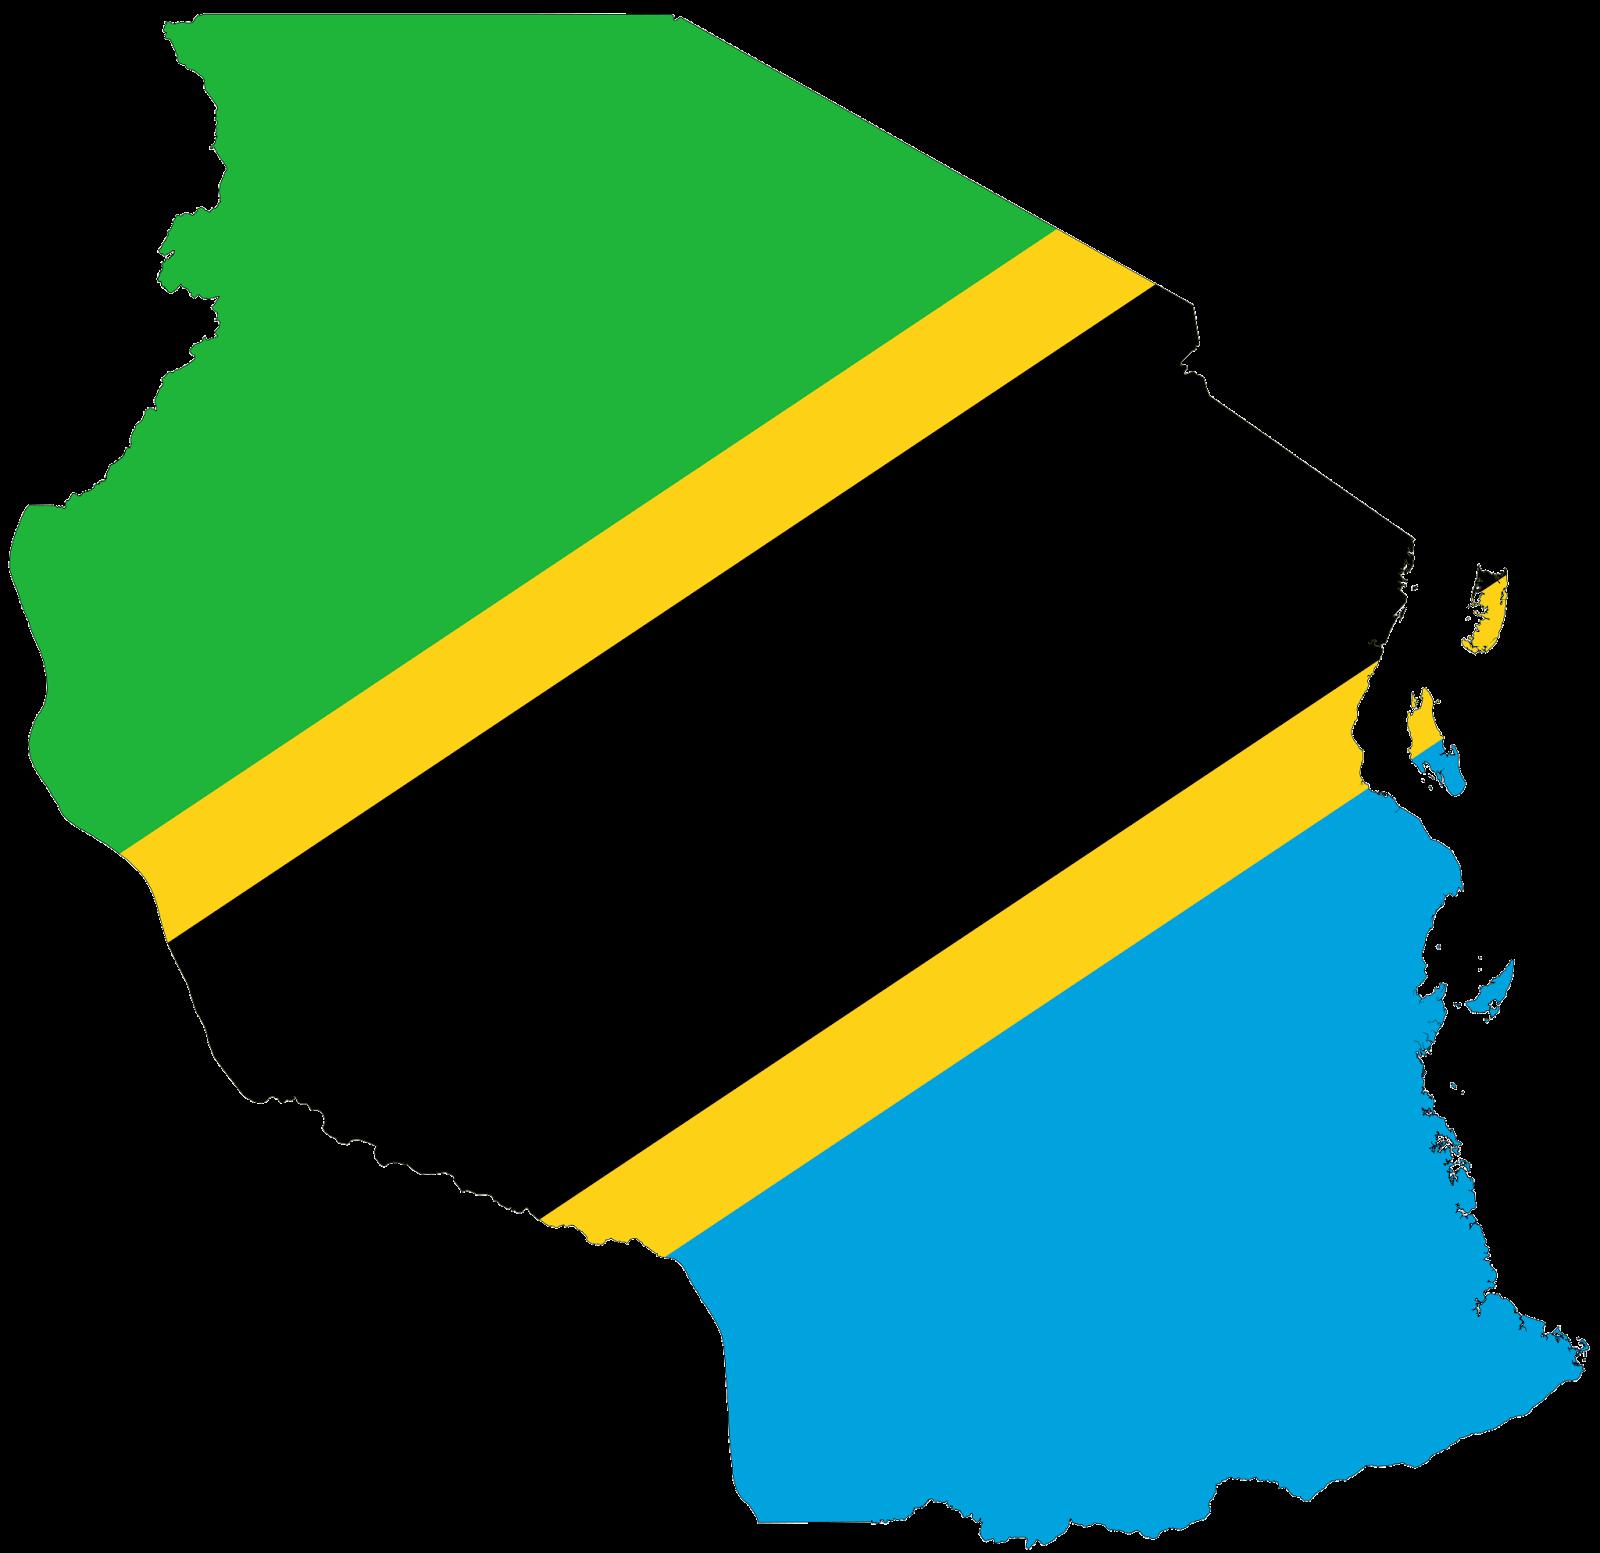 Umutekano:Tanzania ntishyigikiye ko FDLR iraswaho igiye yahawe kitageze